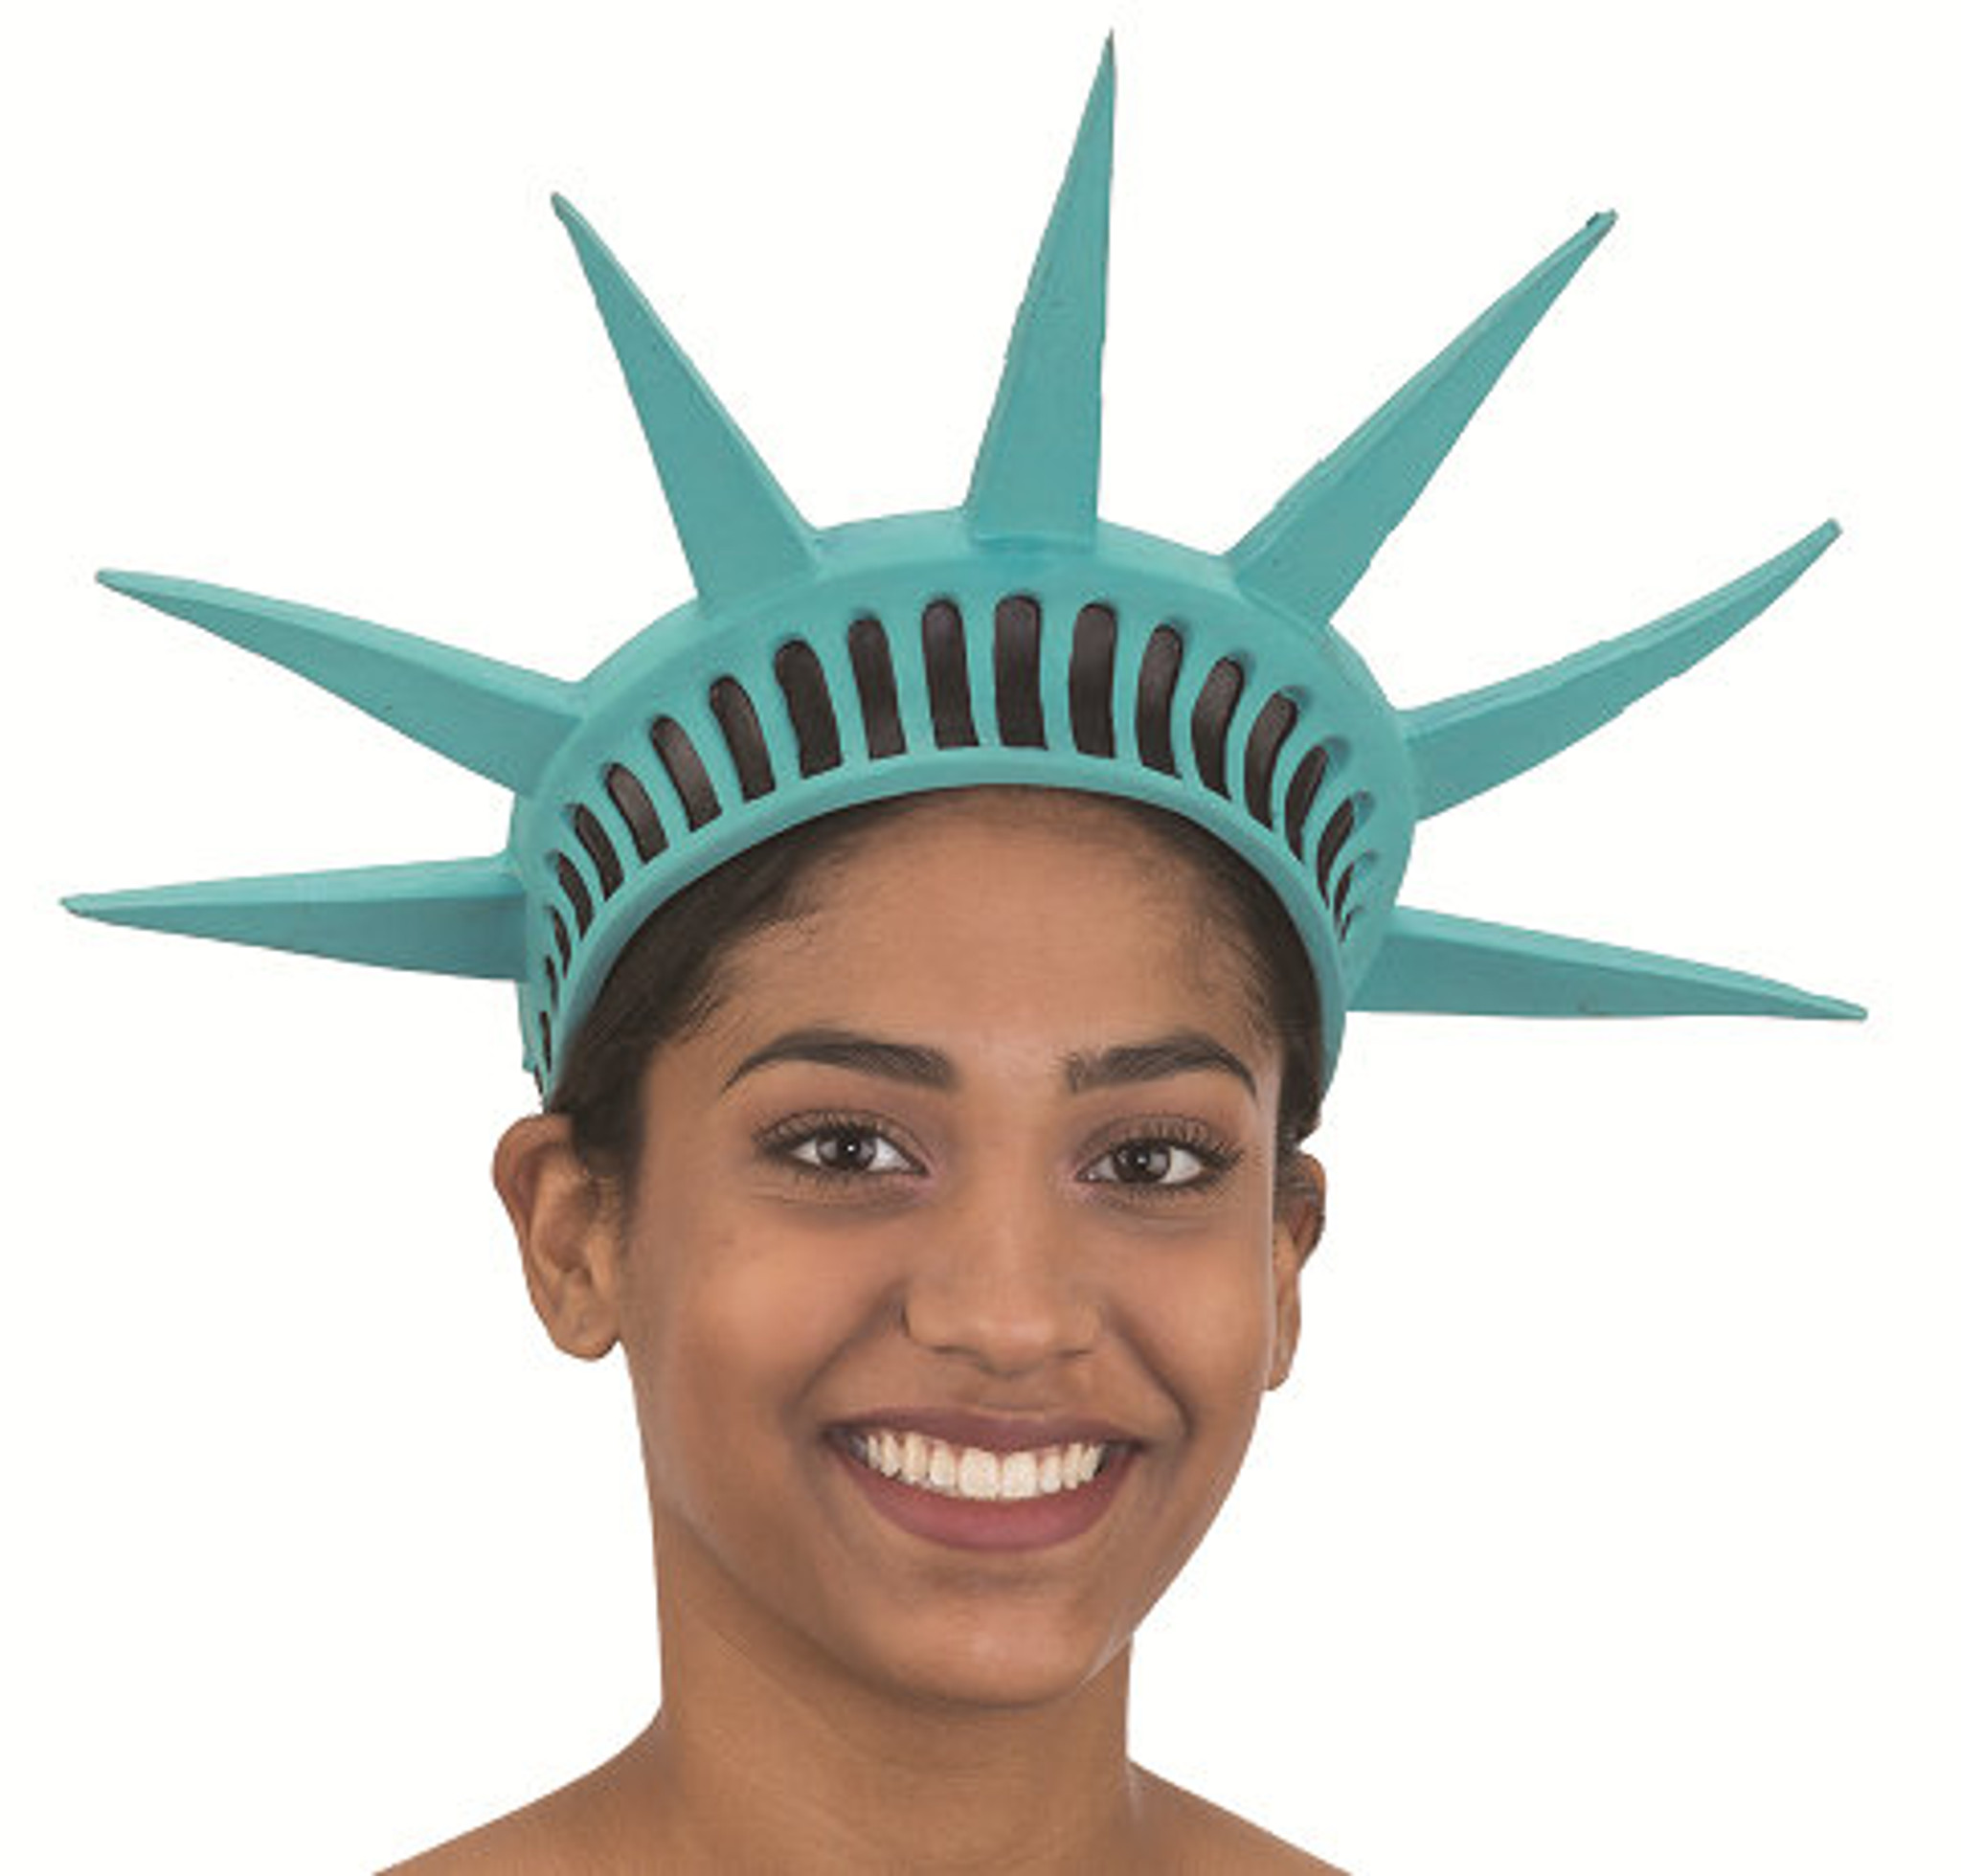 Statue Of Liberty Headband Imaginations Costume Dance